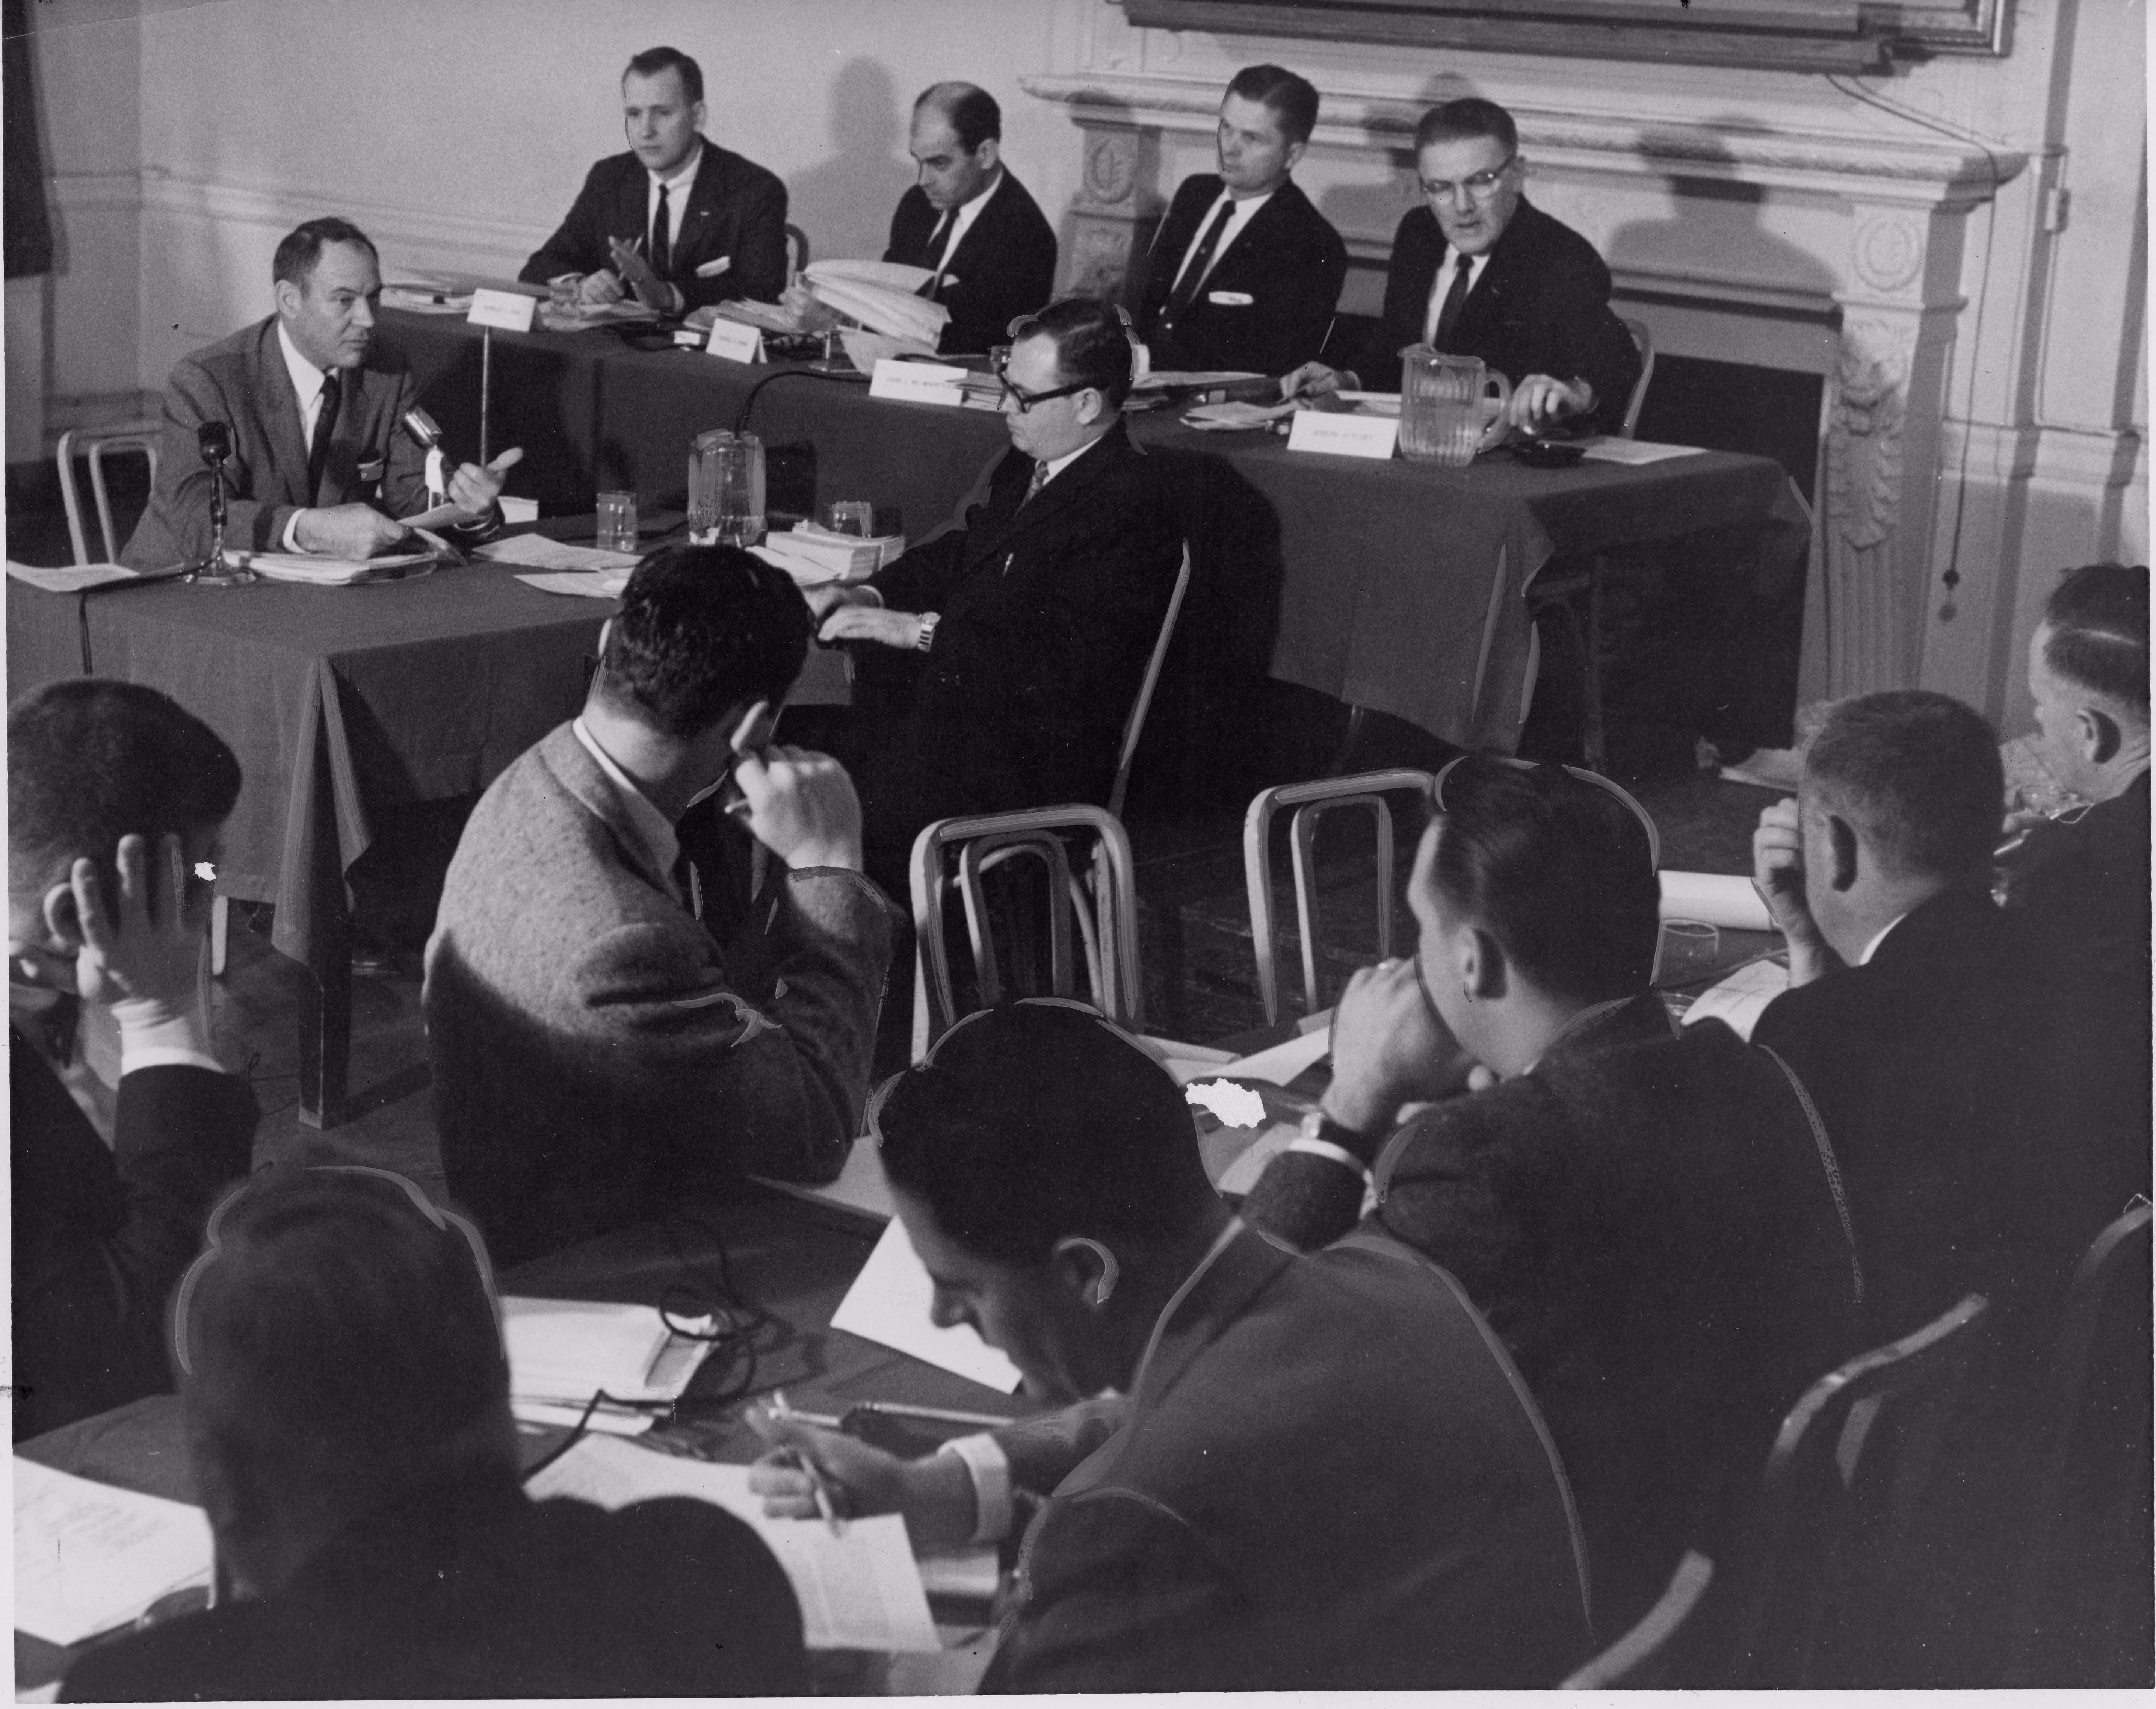 Public hearing on crash held at the Genetti hotel in Williamsport, Pa January 1960. Photo courtesy of the Williamsport Sun Gazette archive.